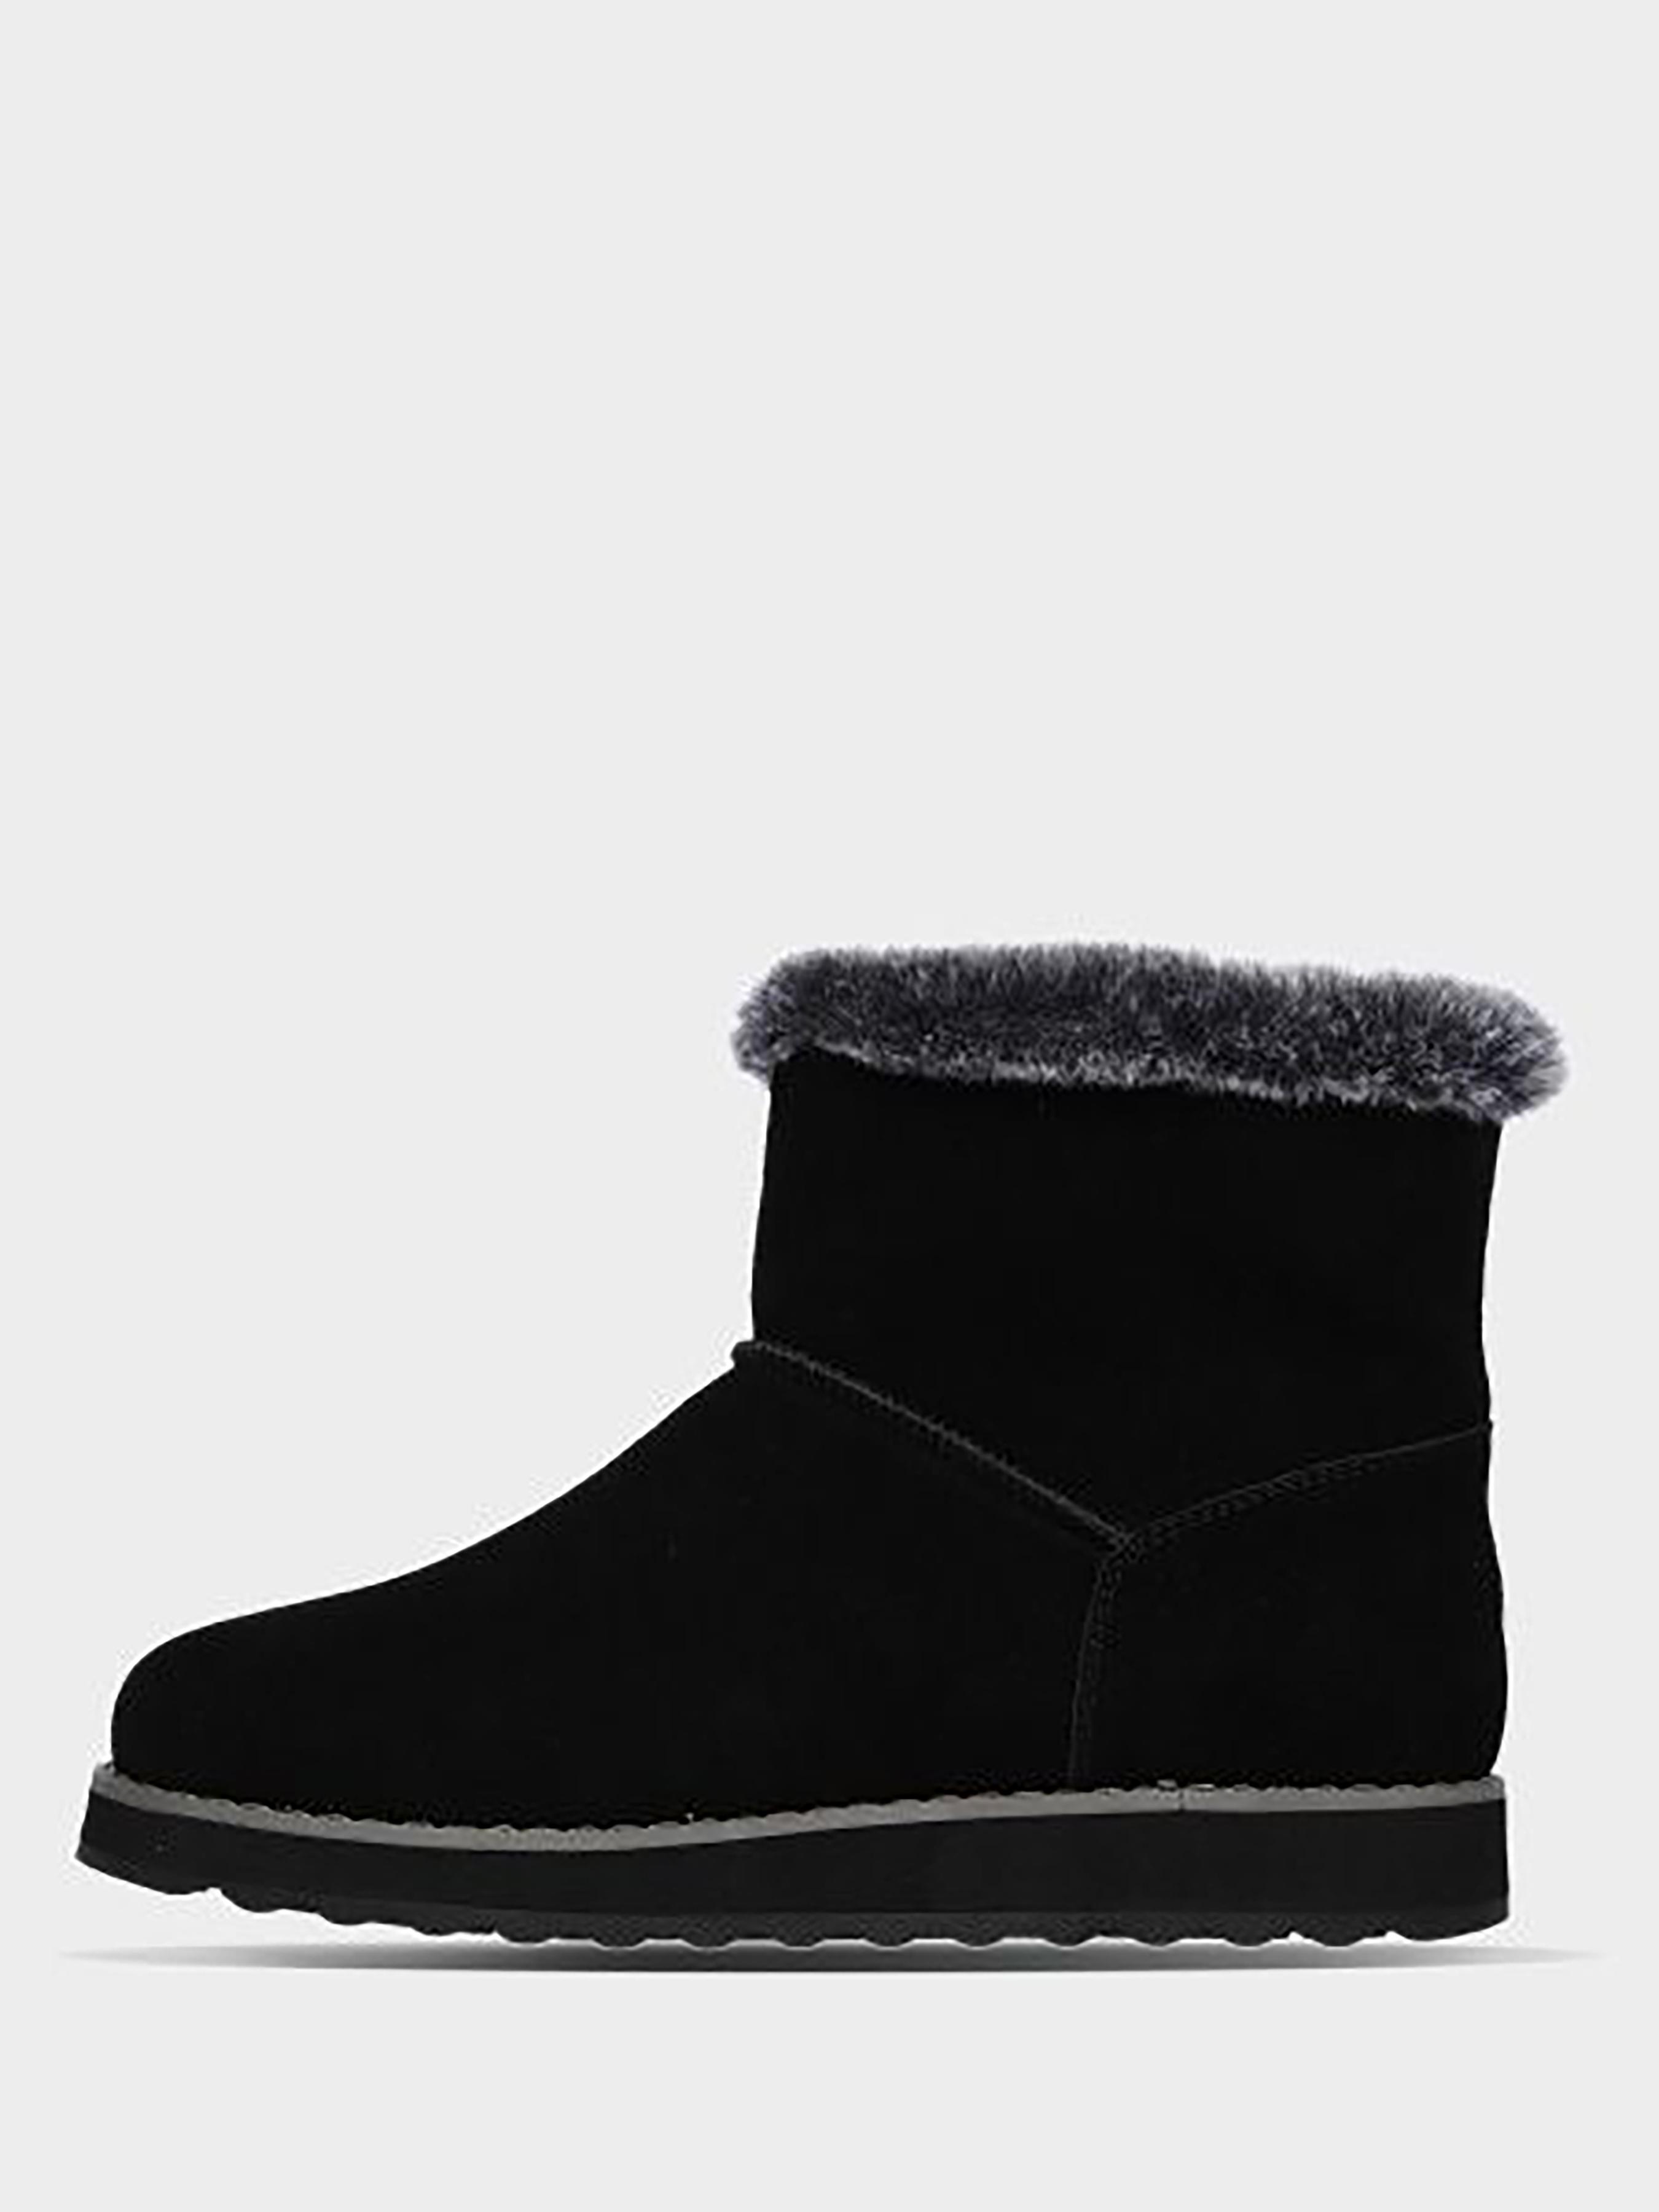 Ботинки для женщин Skechers KW5140 размеры обуви, 2017